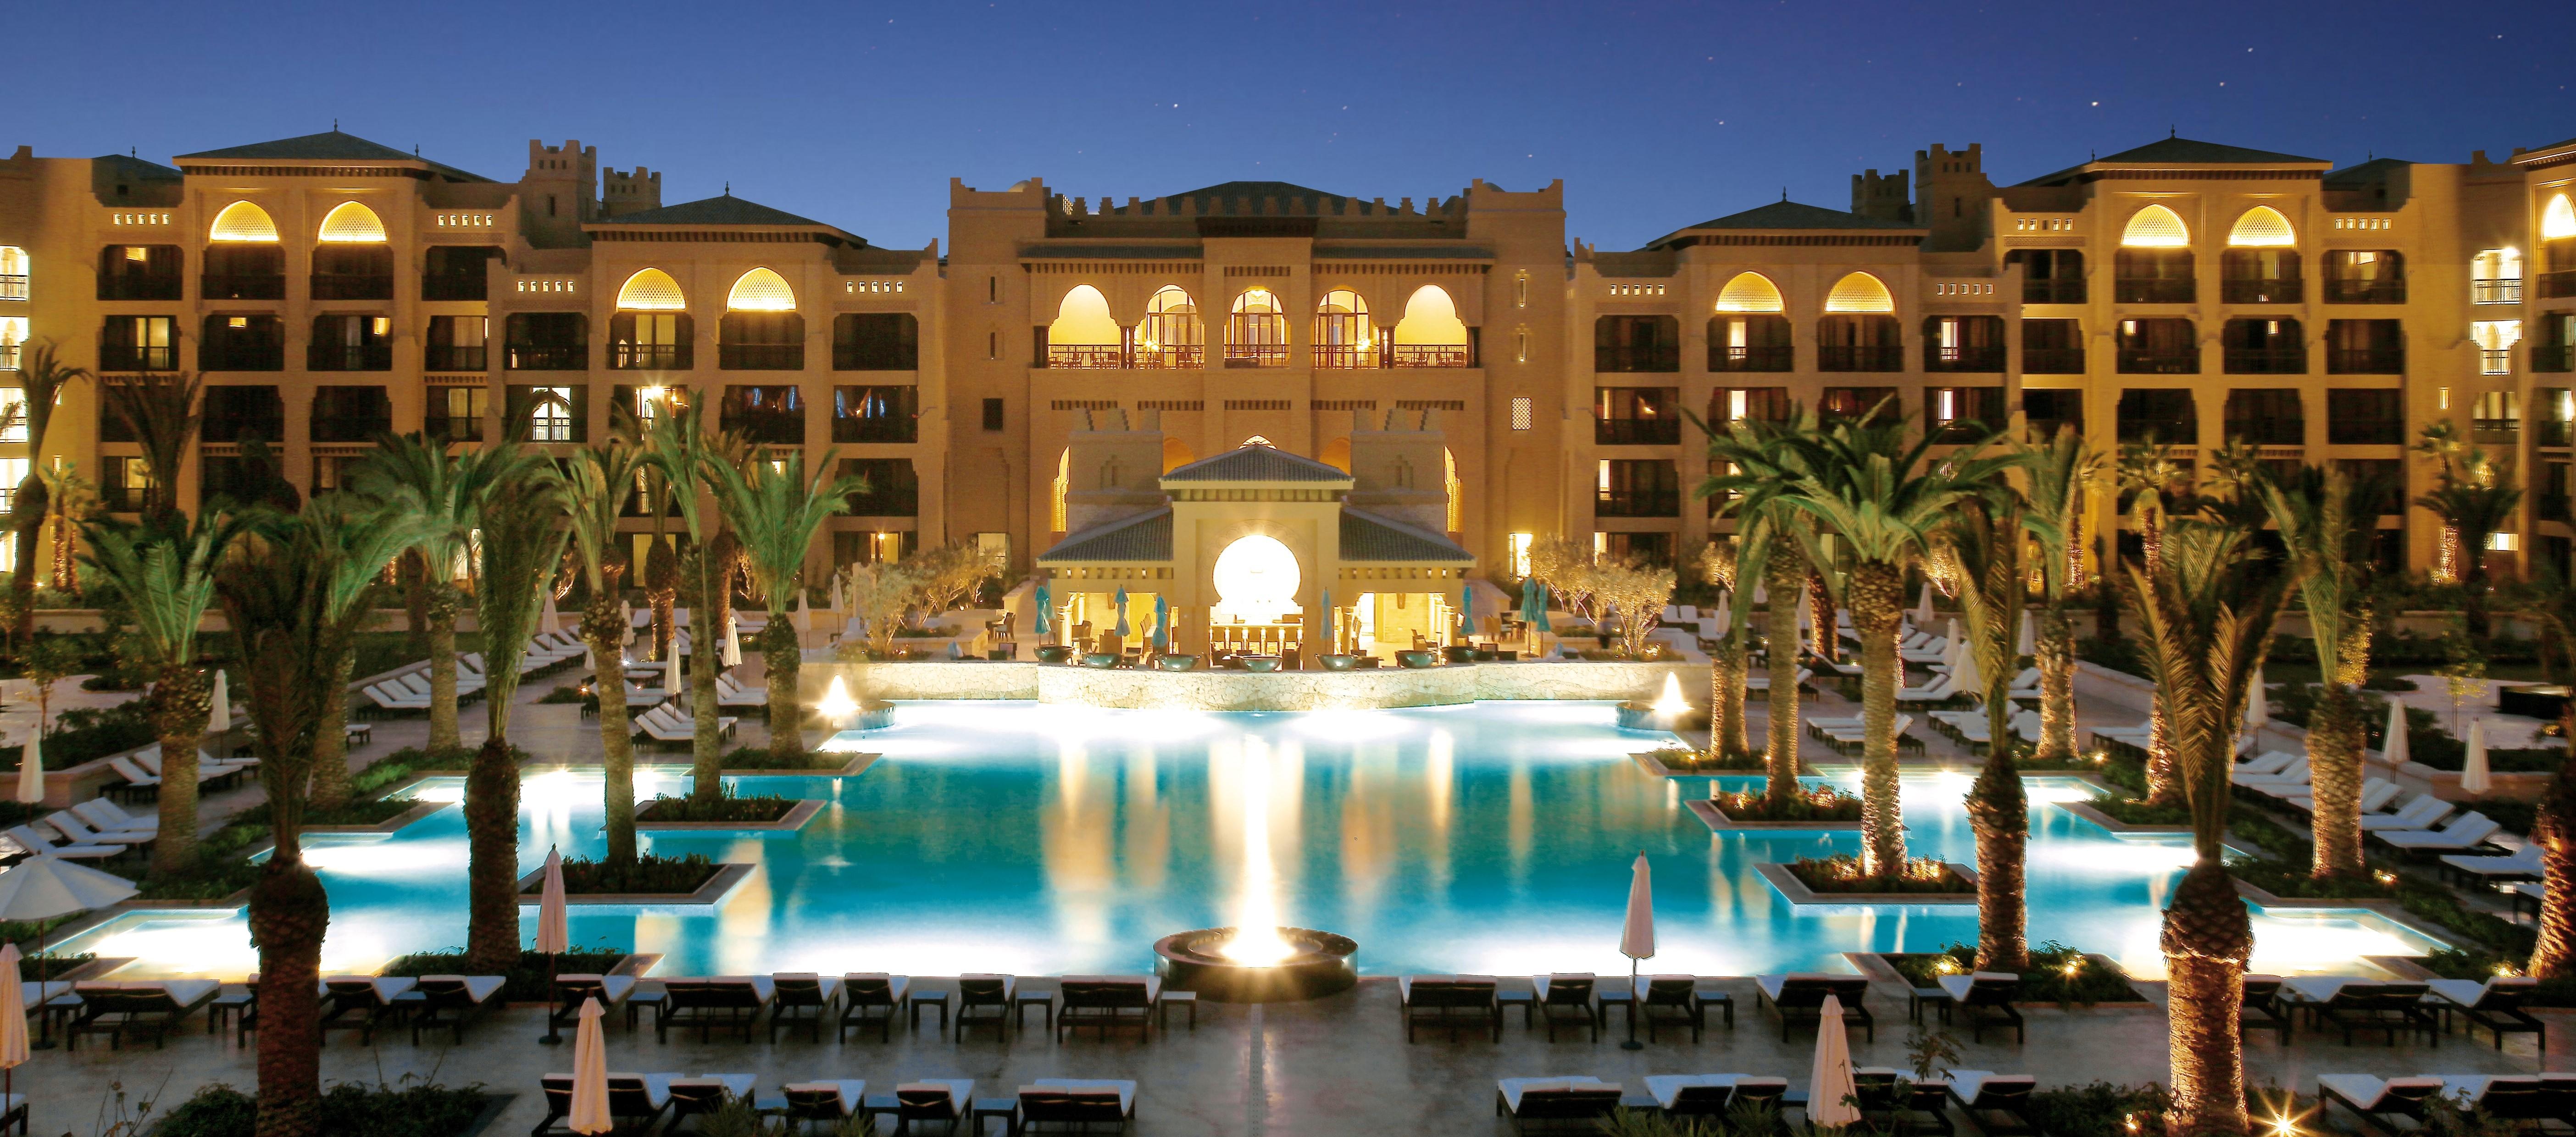 mazagan-beach-resort-morocco-main-pool